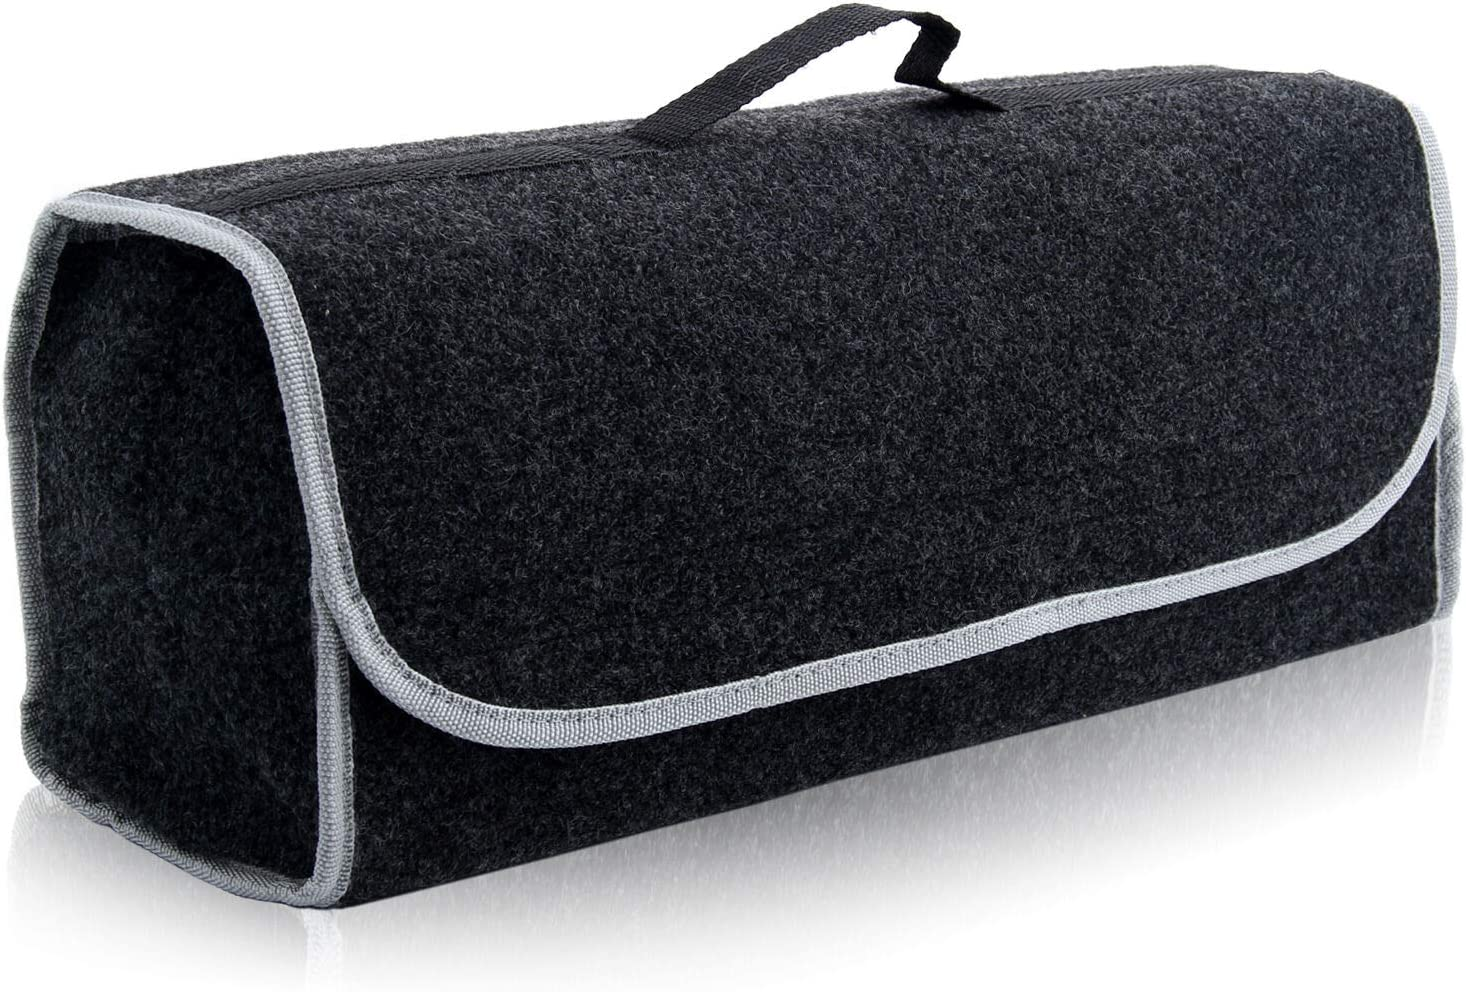 BALLSHOP Car Storage Bag Car Trunk Storage Bag Felt Cloth Folded Bag Organiser Tools